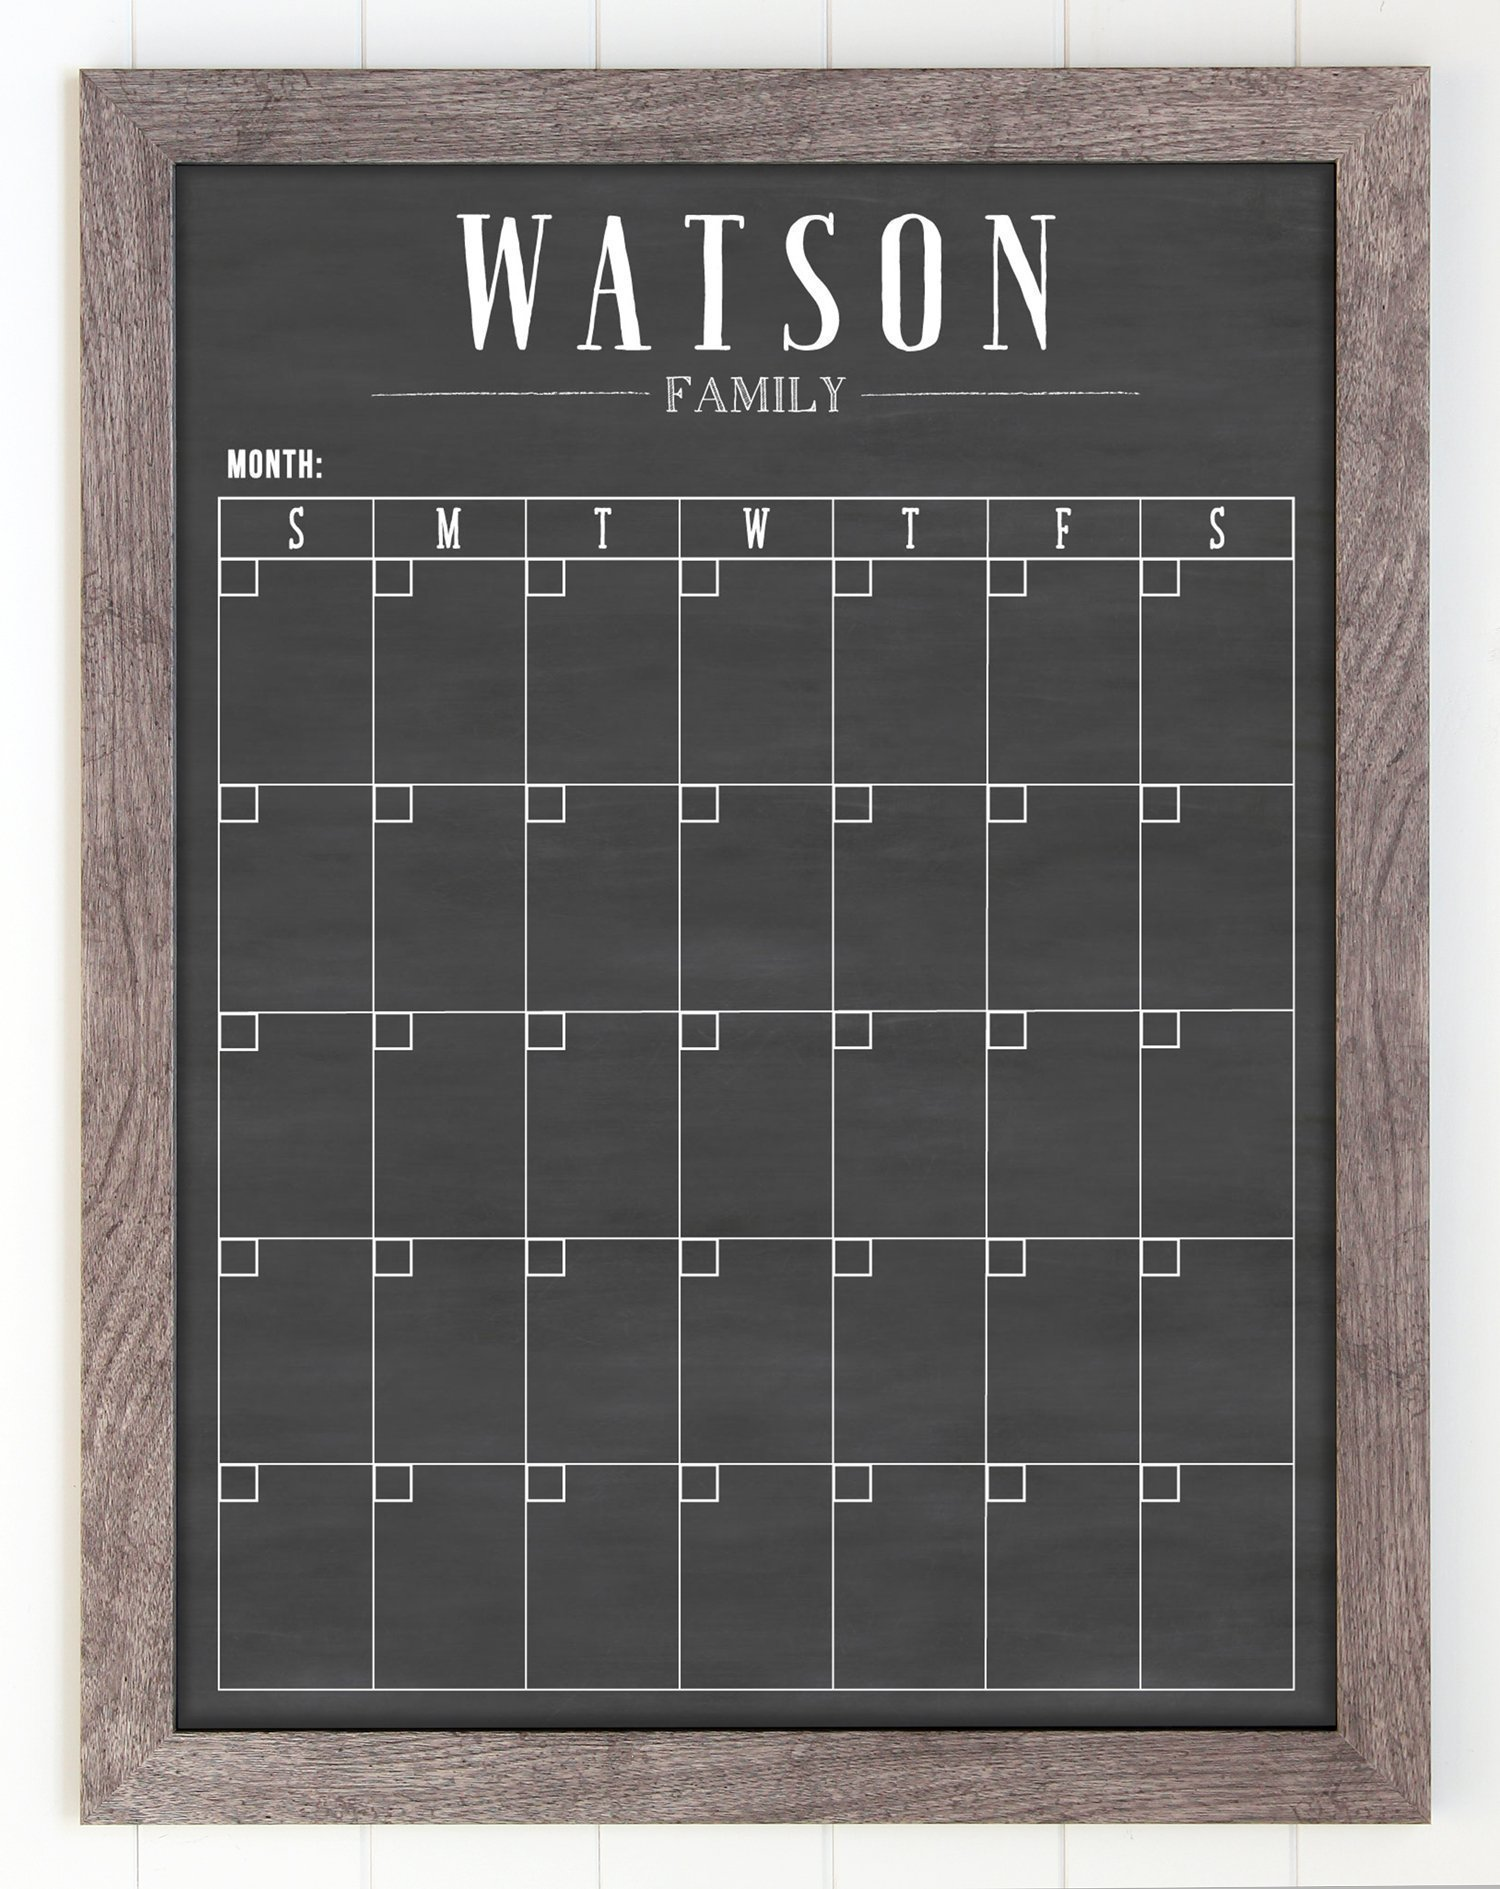 Dry Erase Framed Calendar, 18x24 Customized Dry Erase Wall Calendar, Modern Style Chalkboard Calendar, Family Framed Calendar, 2018 calendar organizer, Command Center, Planner, Custom